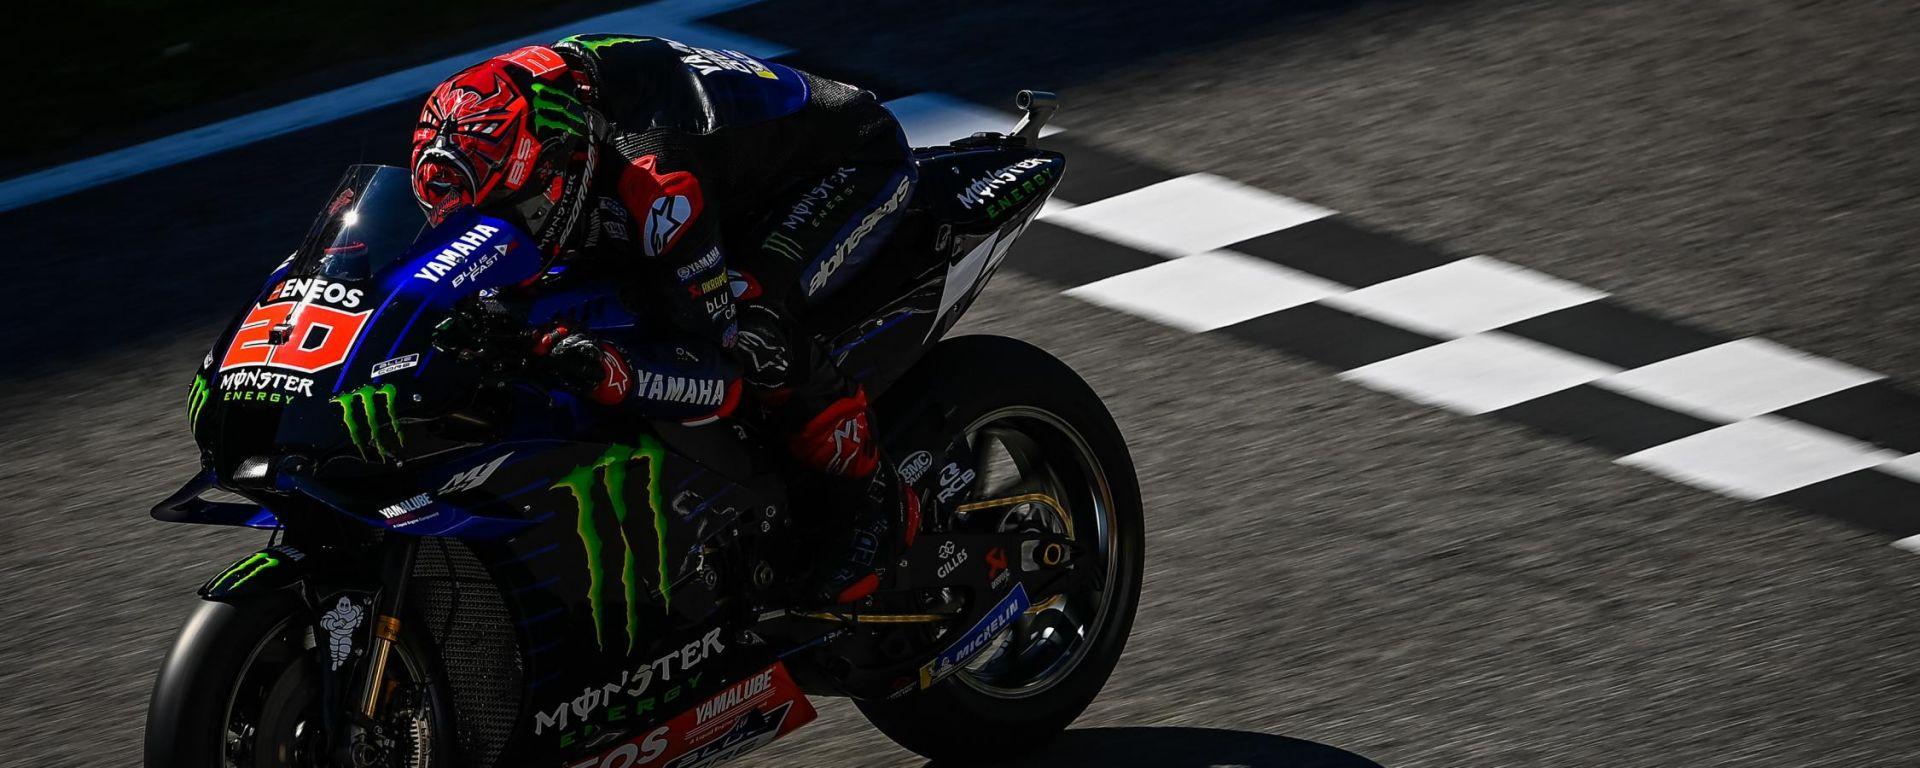 MotoGP Italia 2021, Mugello: Fabio Quartararo (Yamaha)